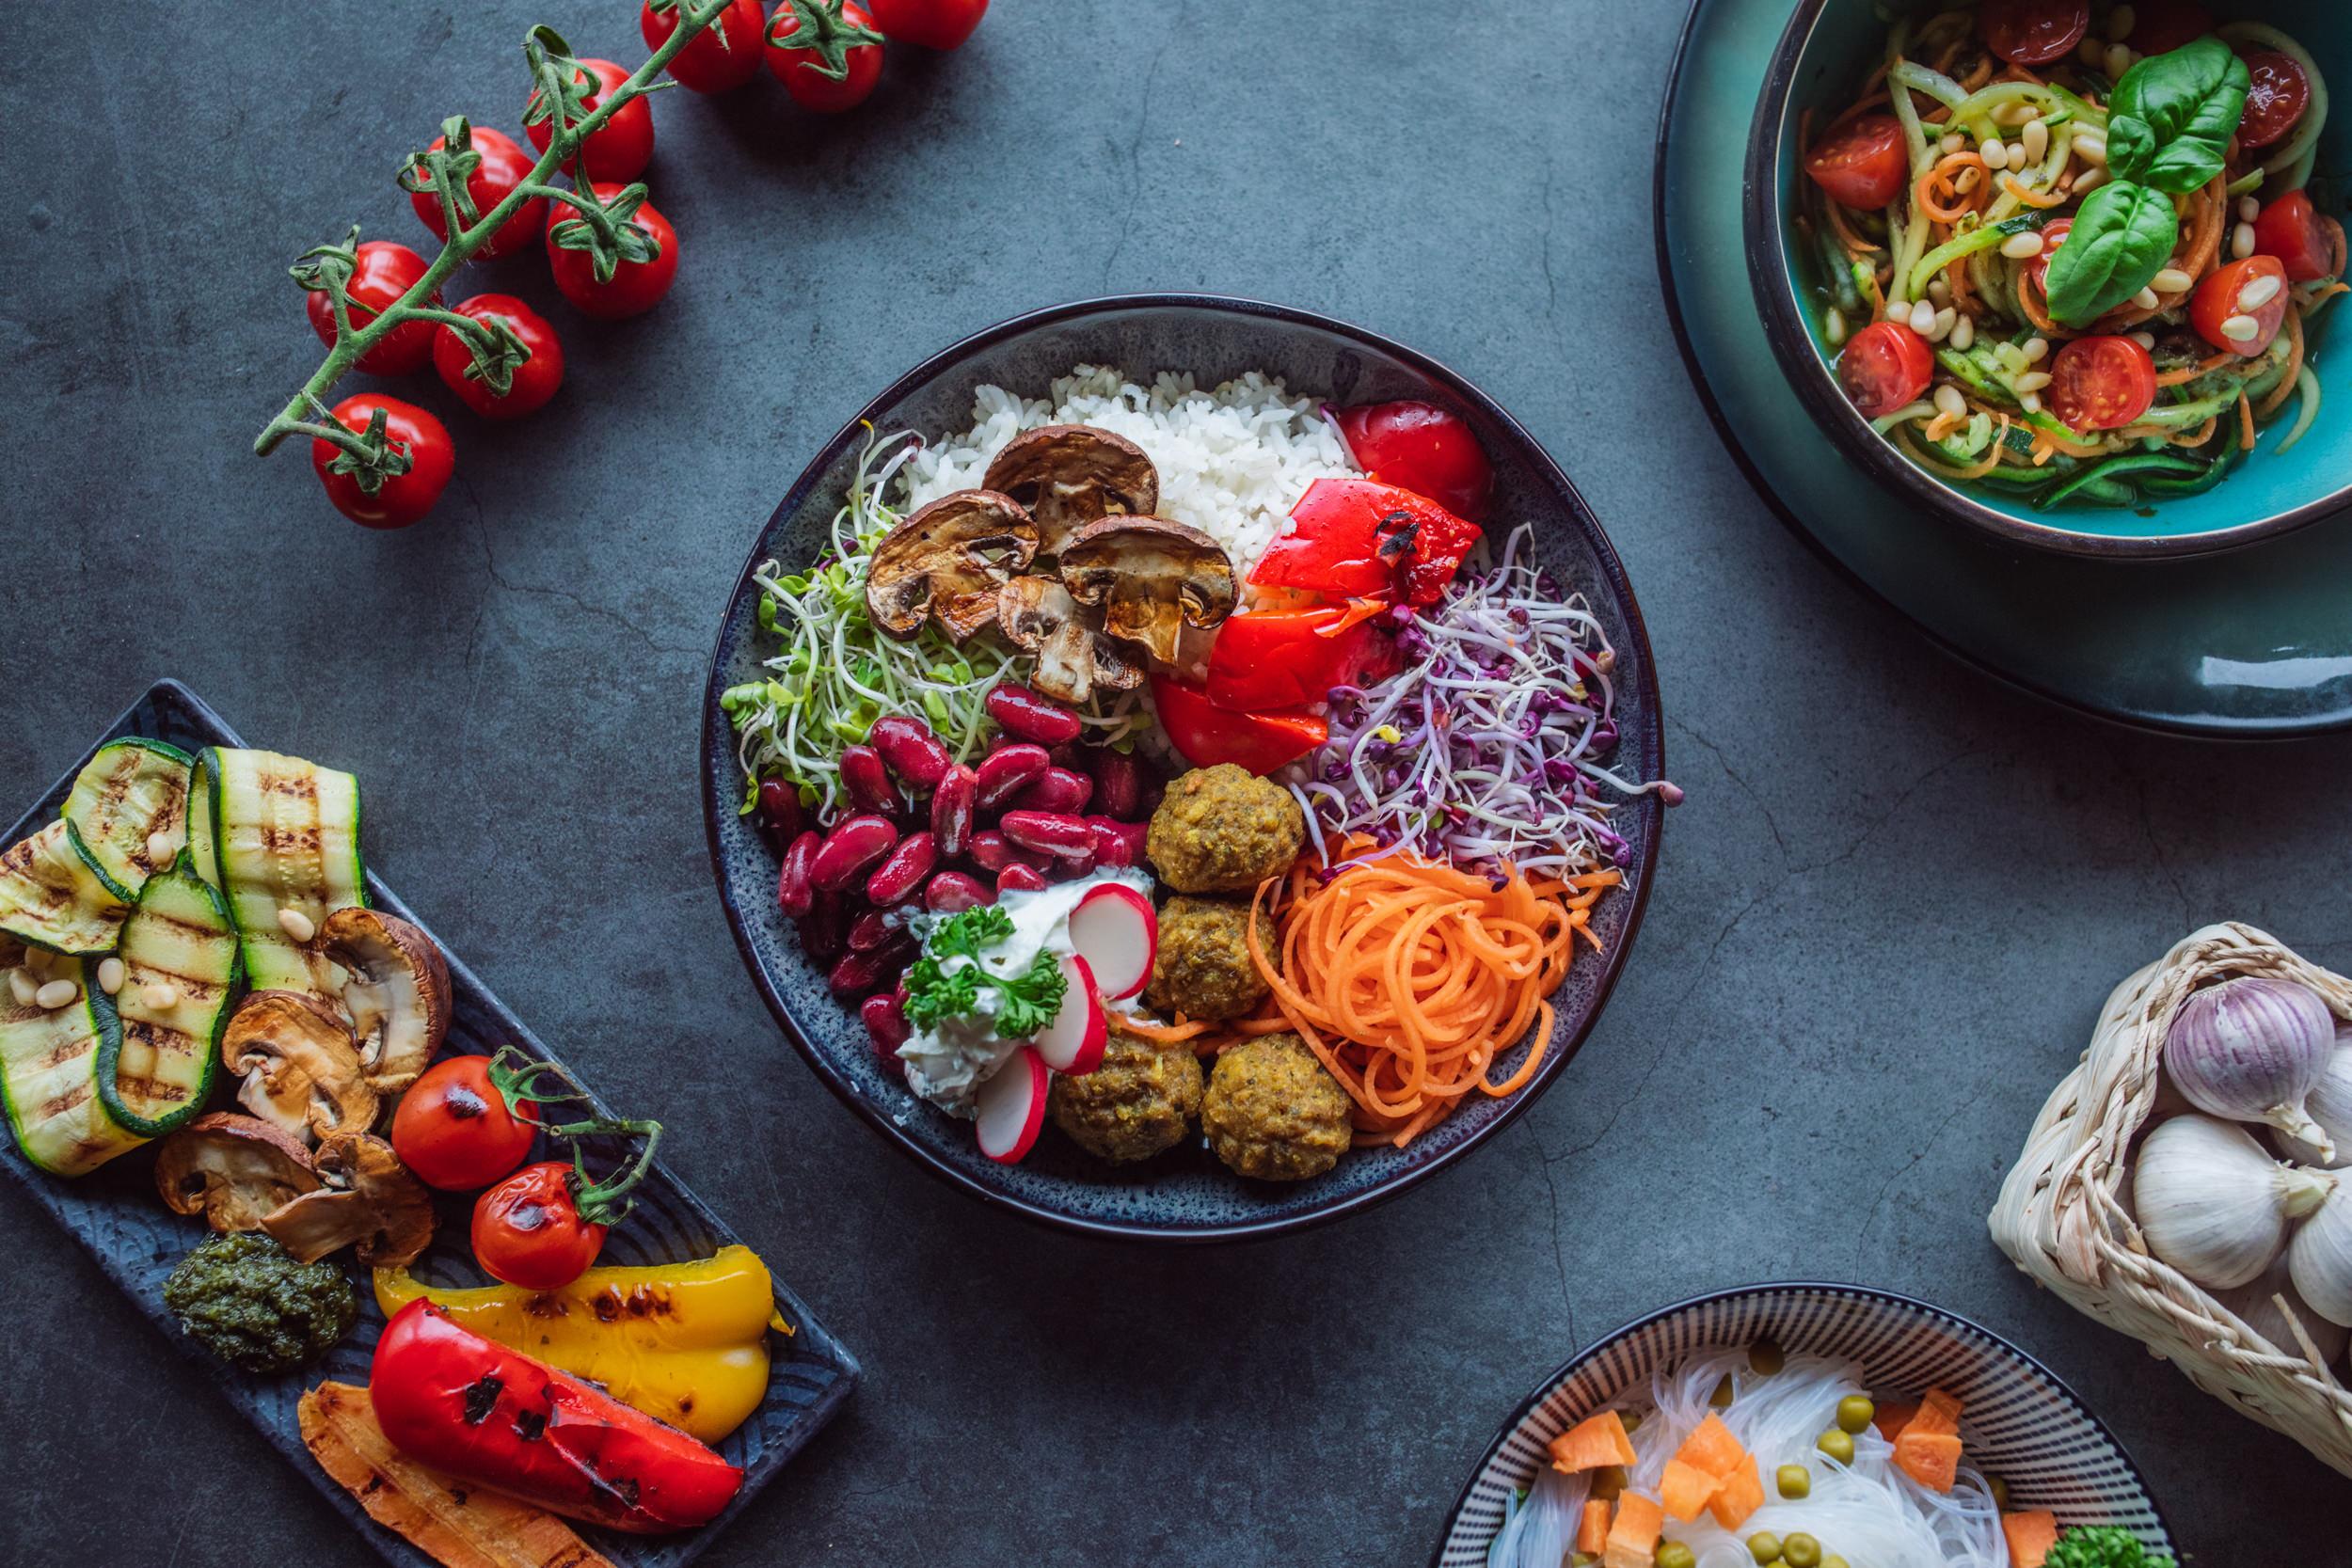 FOOD STUDIO PATRICKSCHMETZER ESSEN 9  Food